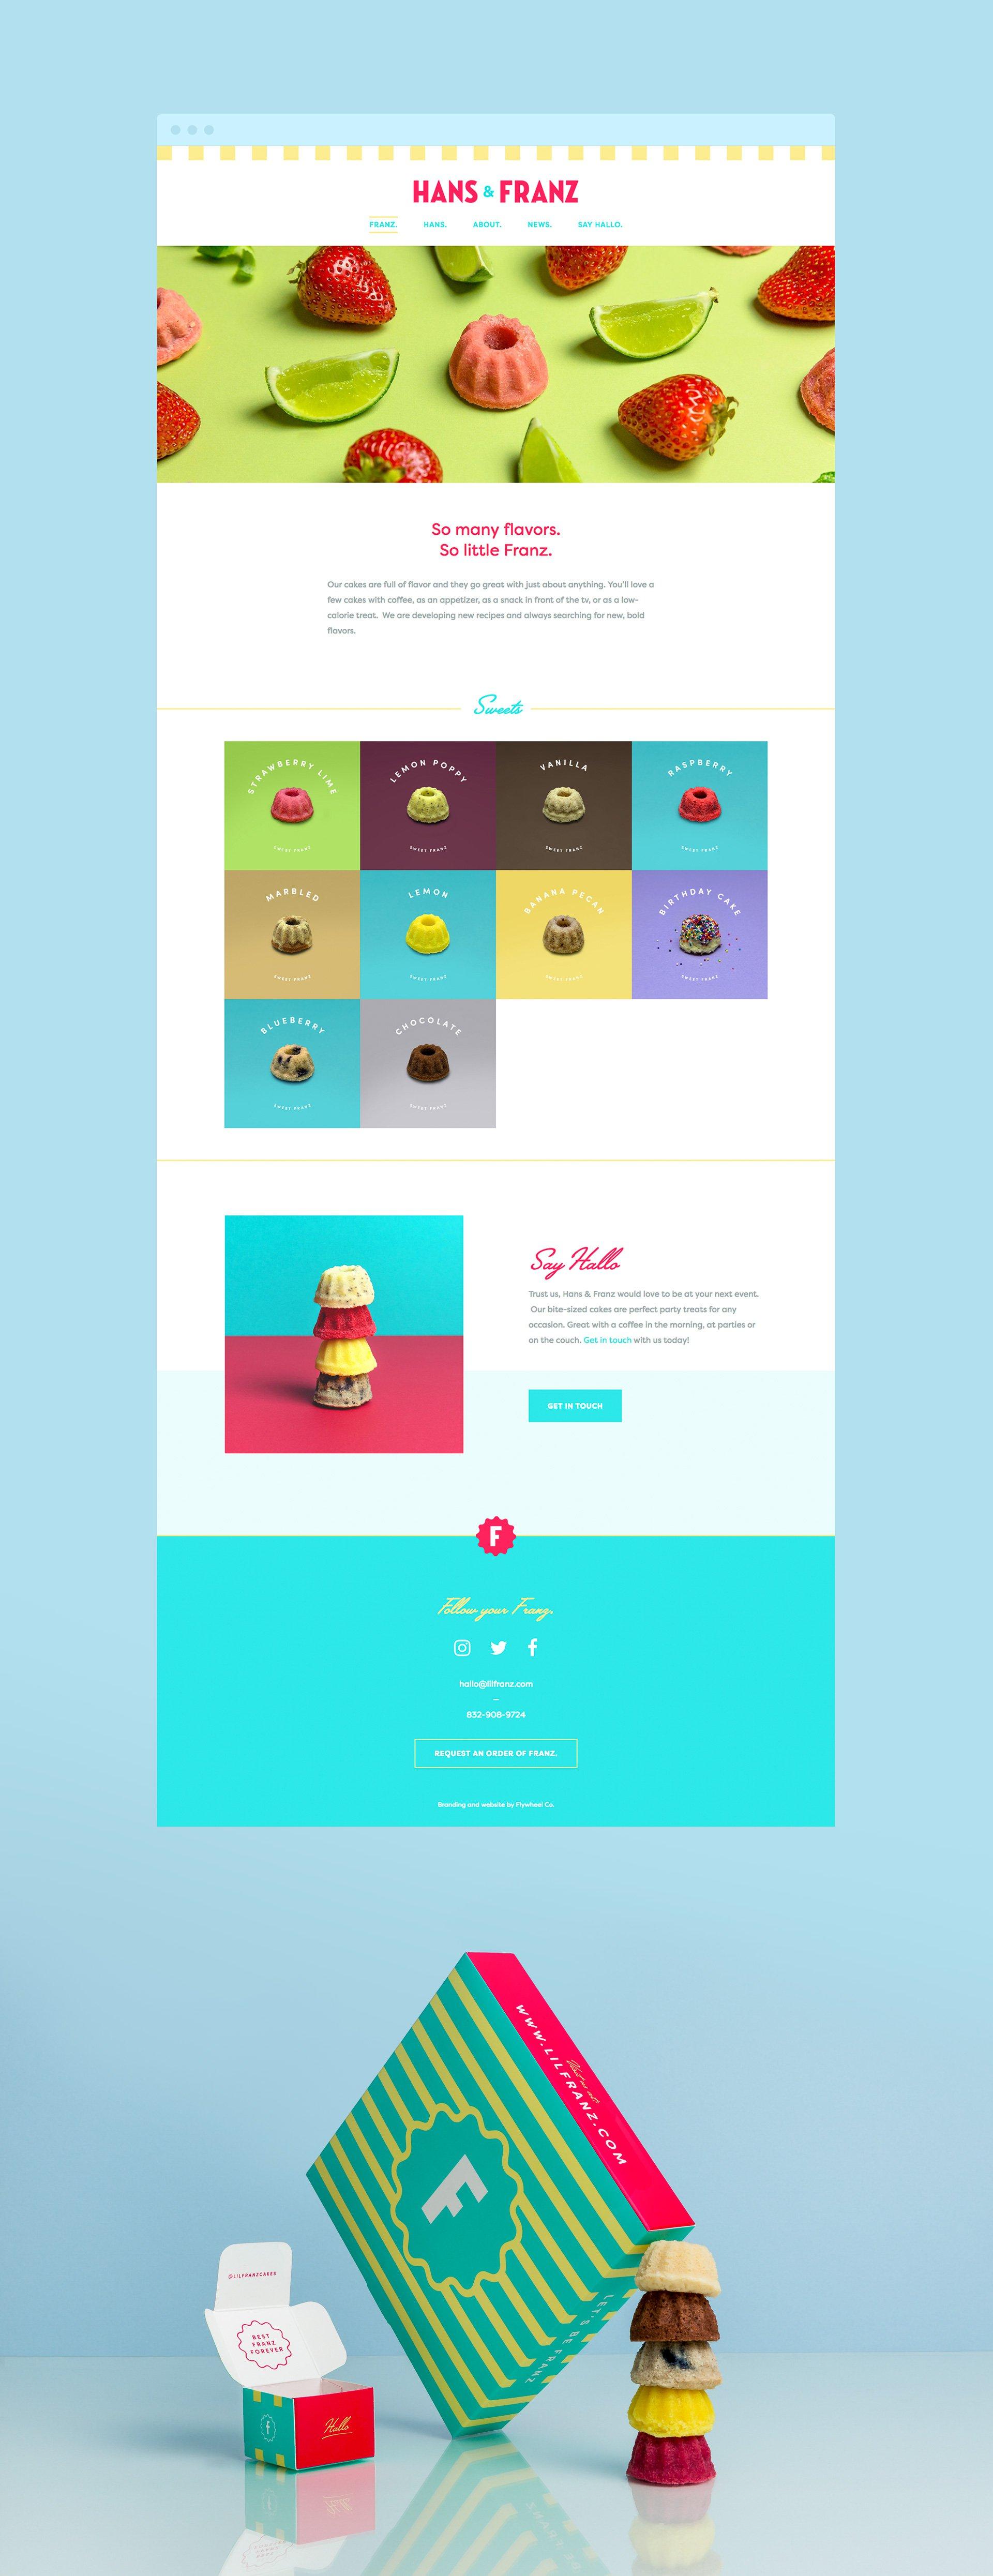 Lil' Franz Website & Packaging